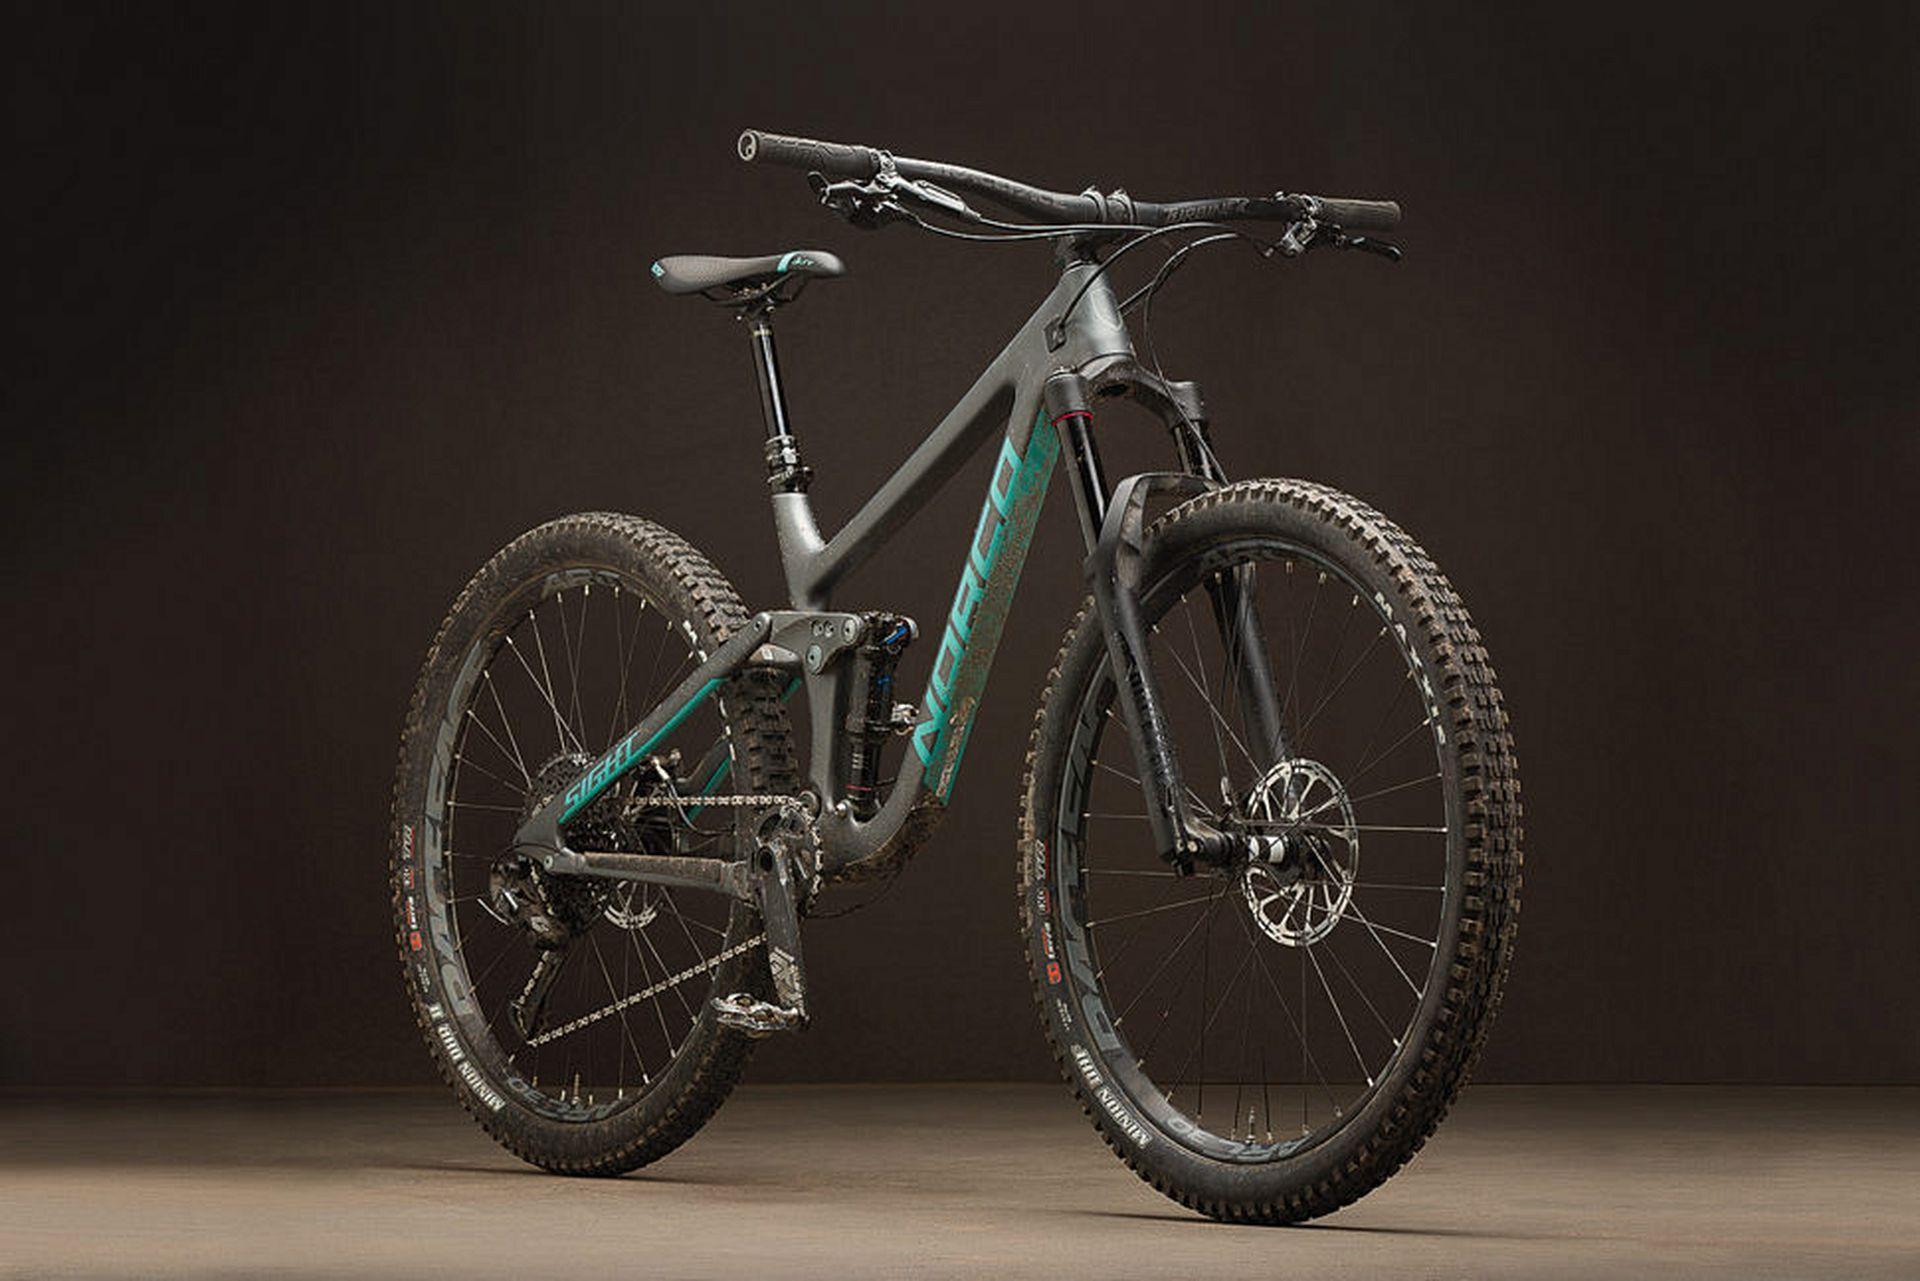 The Best Of The 2018 Bible Bicicletas De Montana Bicicletas